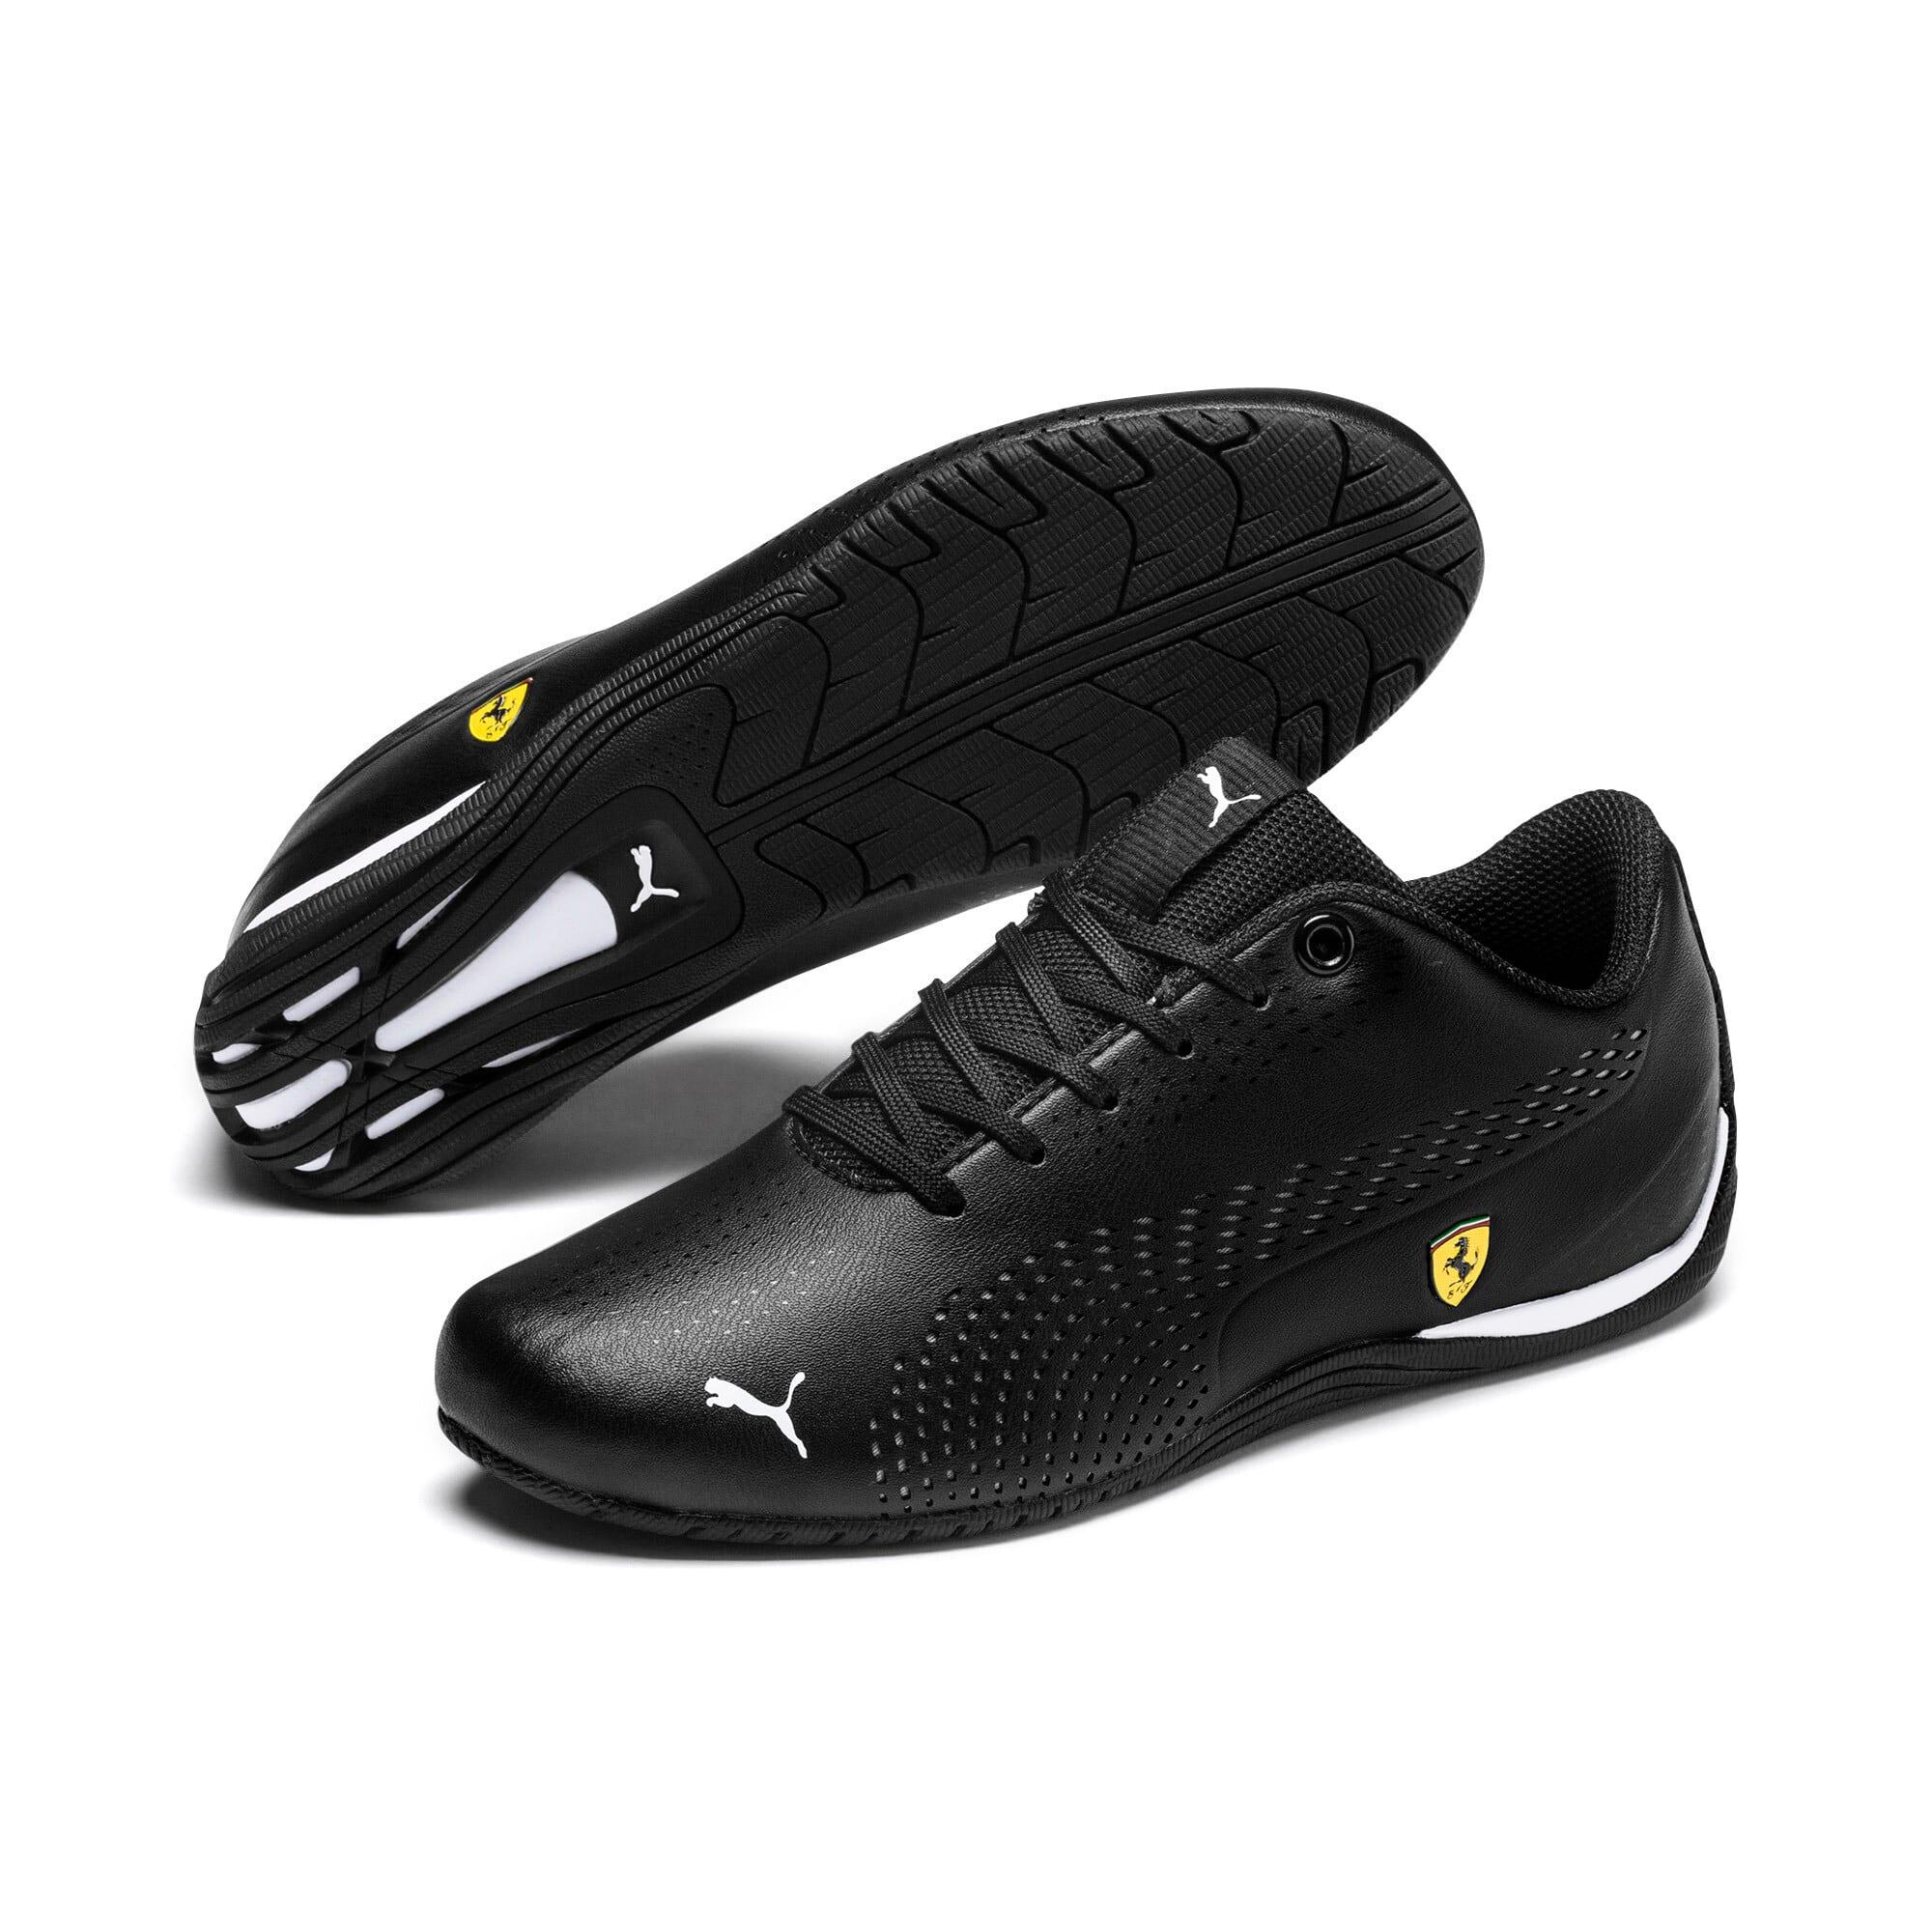 Thumbnail 2 of Scuderia Ferrari Drift Cat 5 Ultra II Shoes JR, Puma Black-Puma White, medium